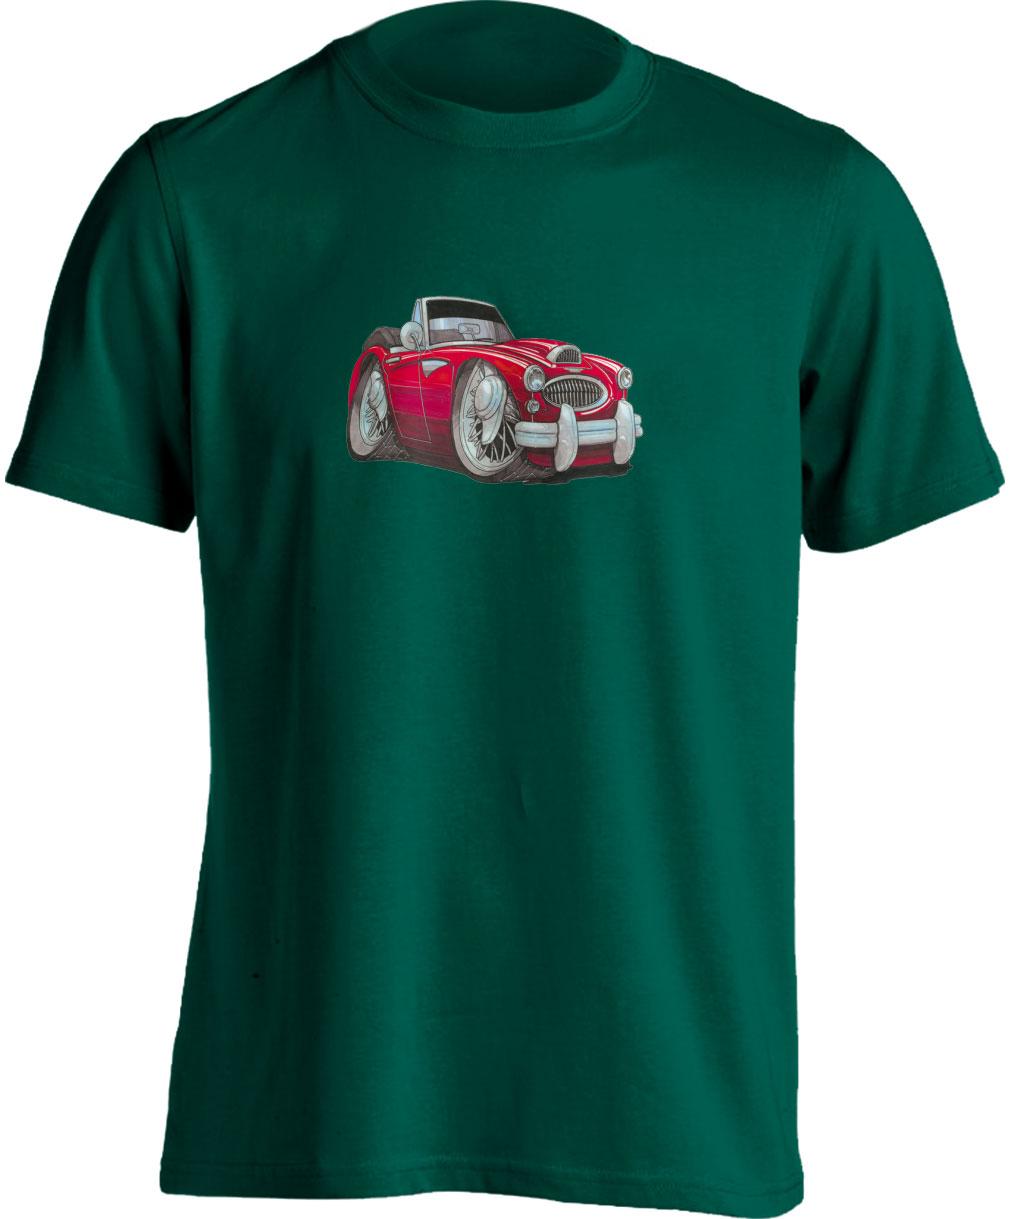 Adults Koolart Austin Healey 3000 Red 0721 T Shirt